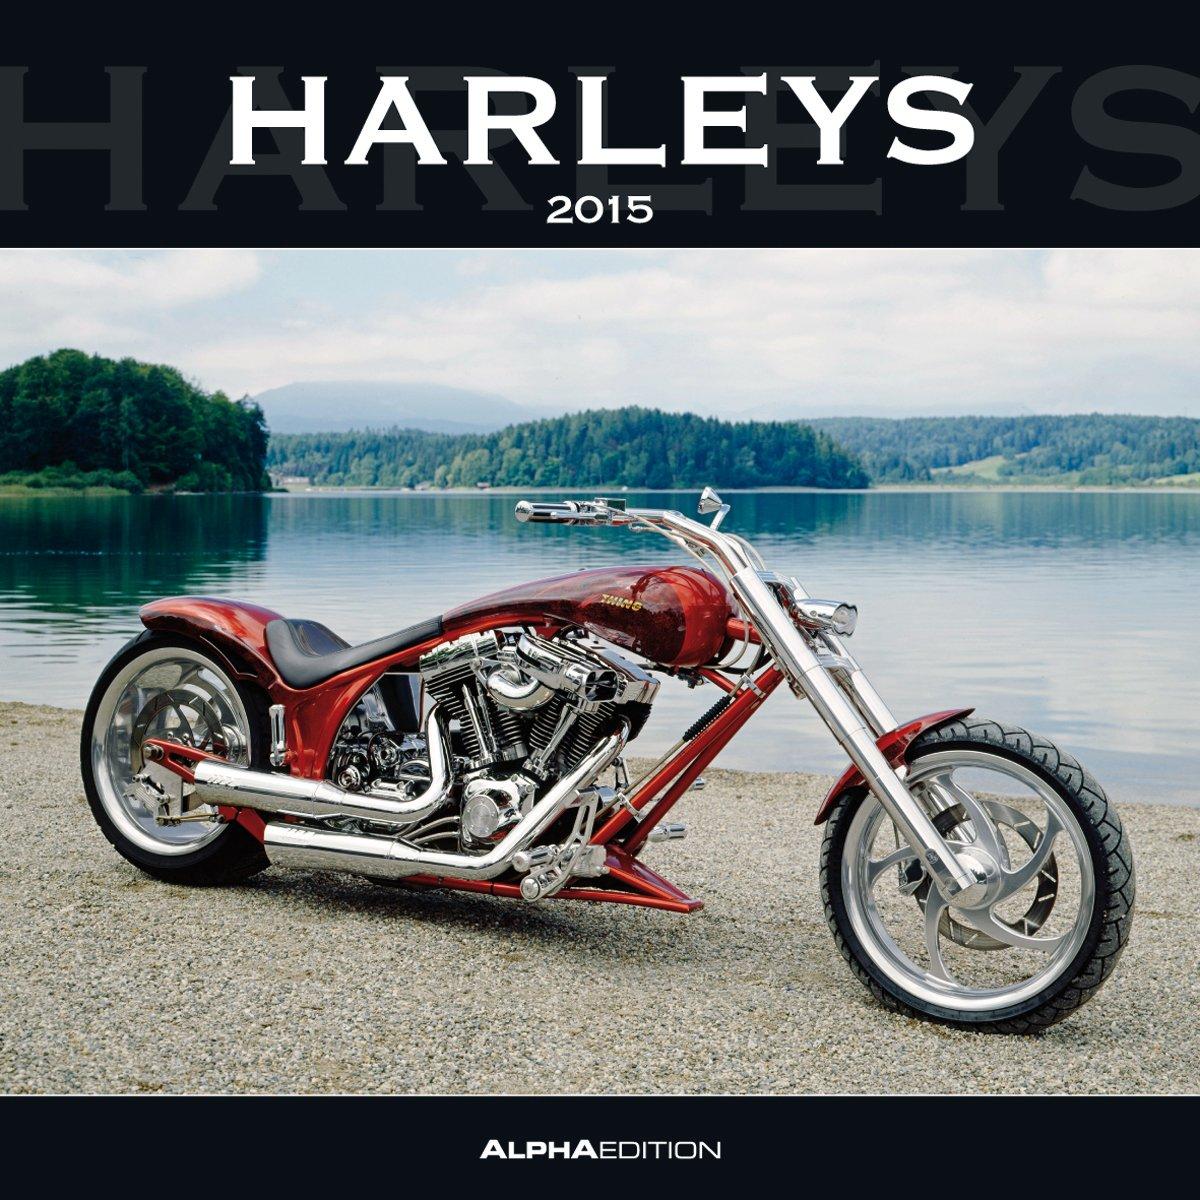 Harleys 2015 - Broschürenkalender (30 x 60 geöffnet)